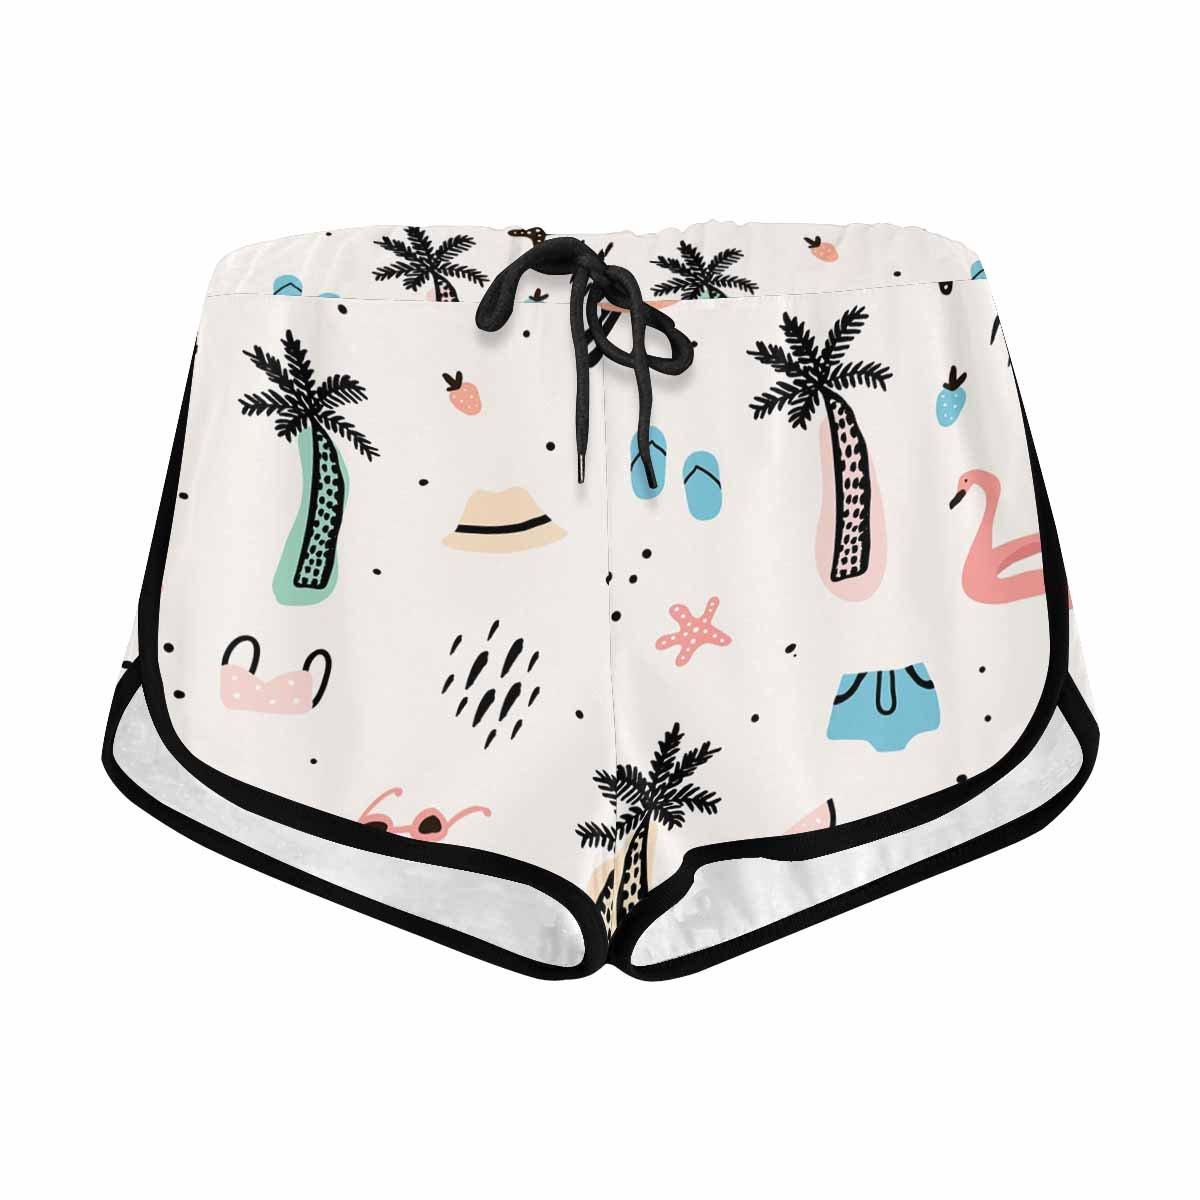 InterestPrint Women's Palm Tree Bikini Hat Sunglasses Summer Casual Shorts S